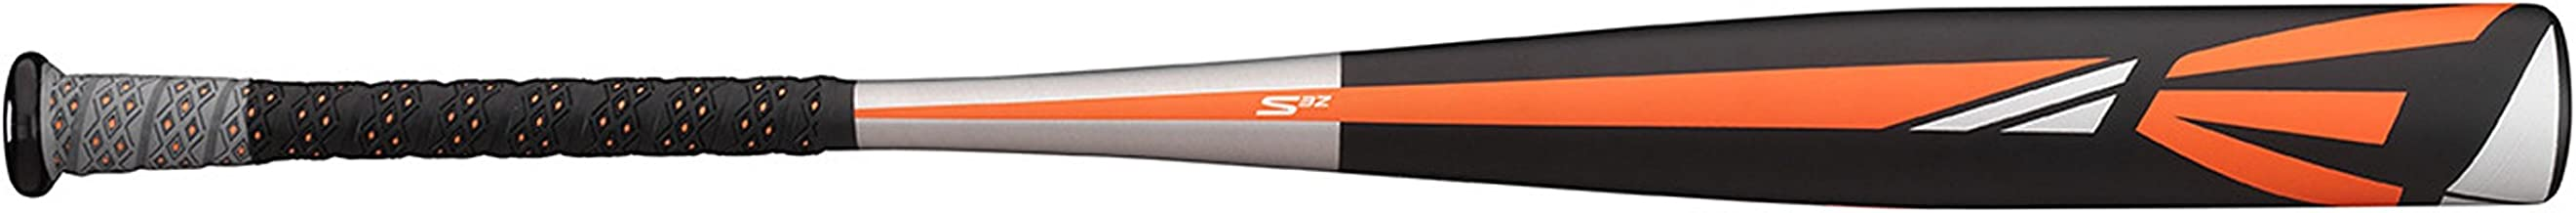 Easton 2015 BB15S3Z S3Z ZCORE -3 BBCOR Baseball Bat